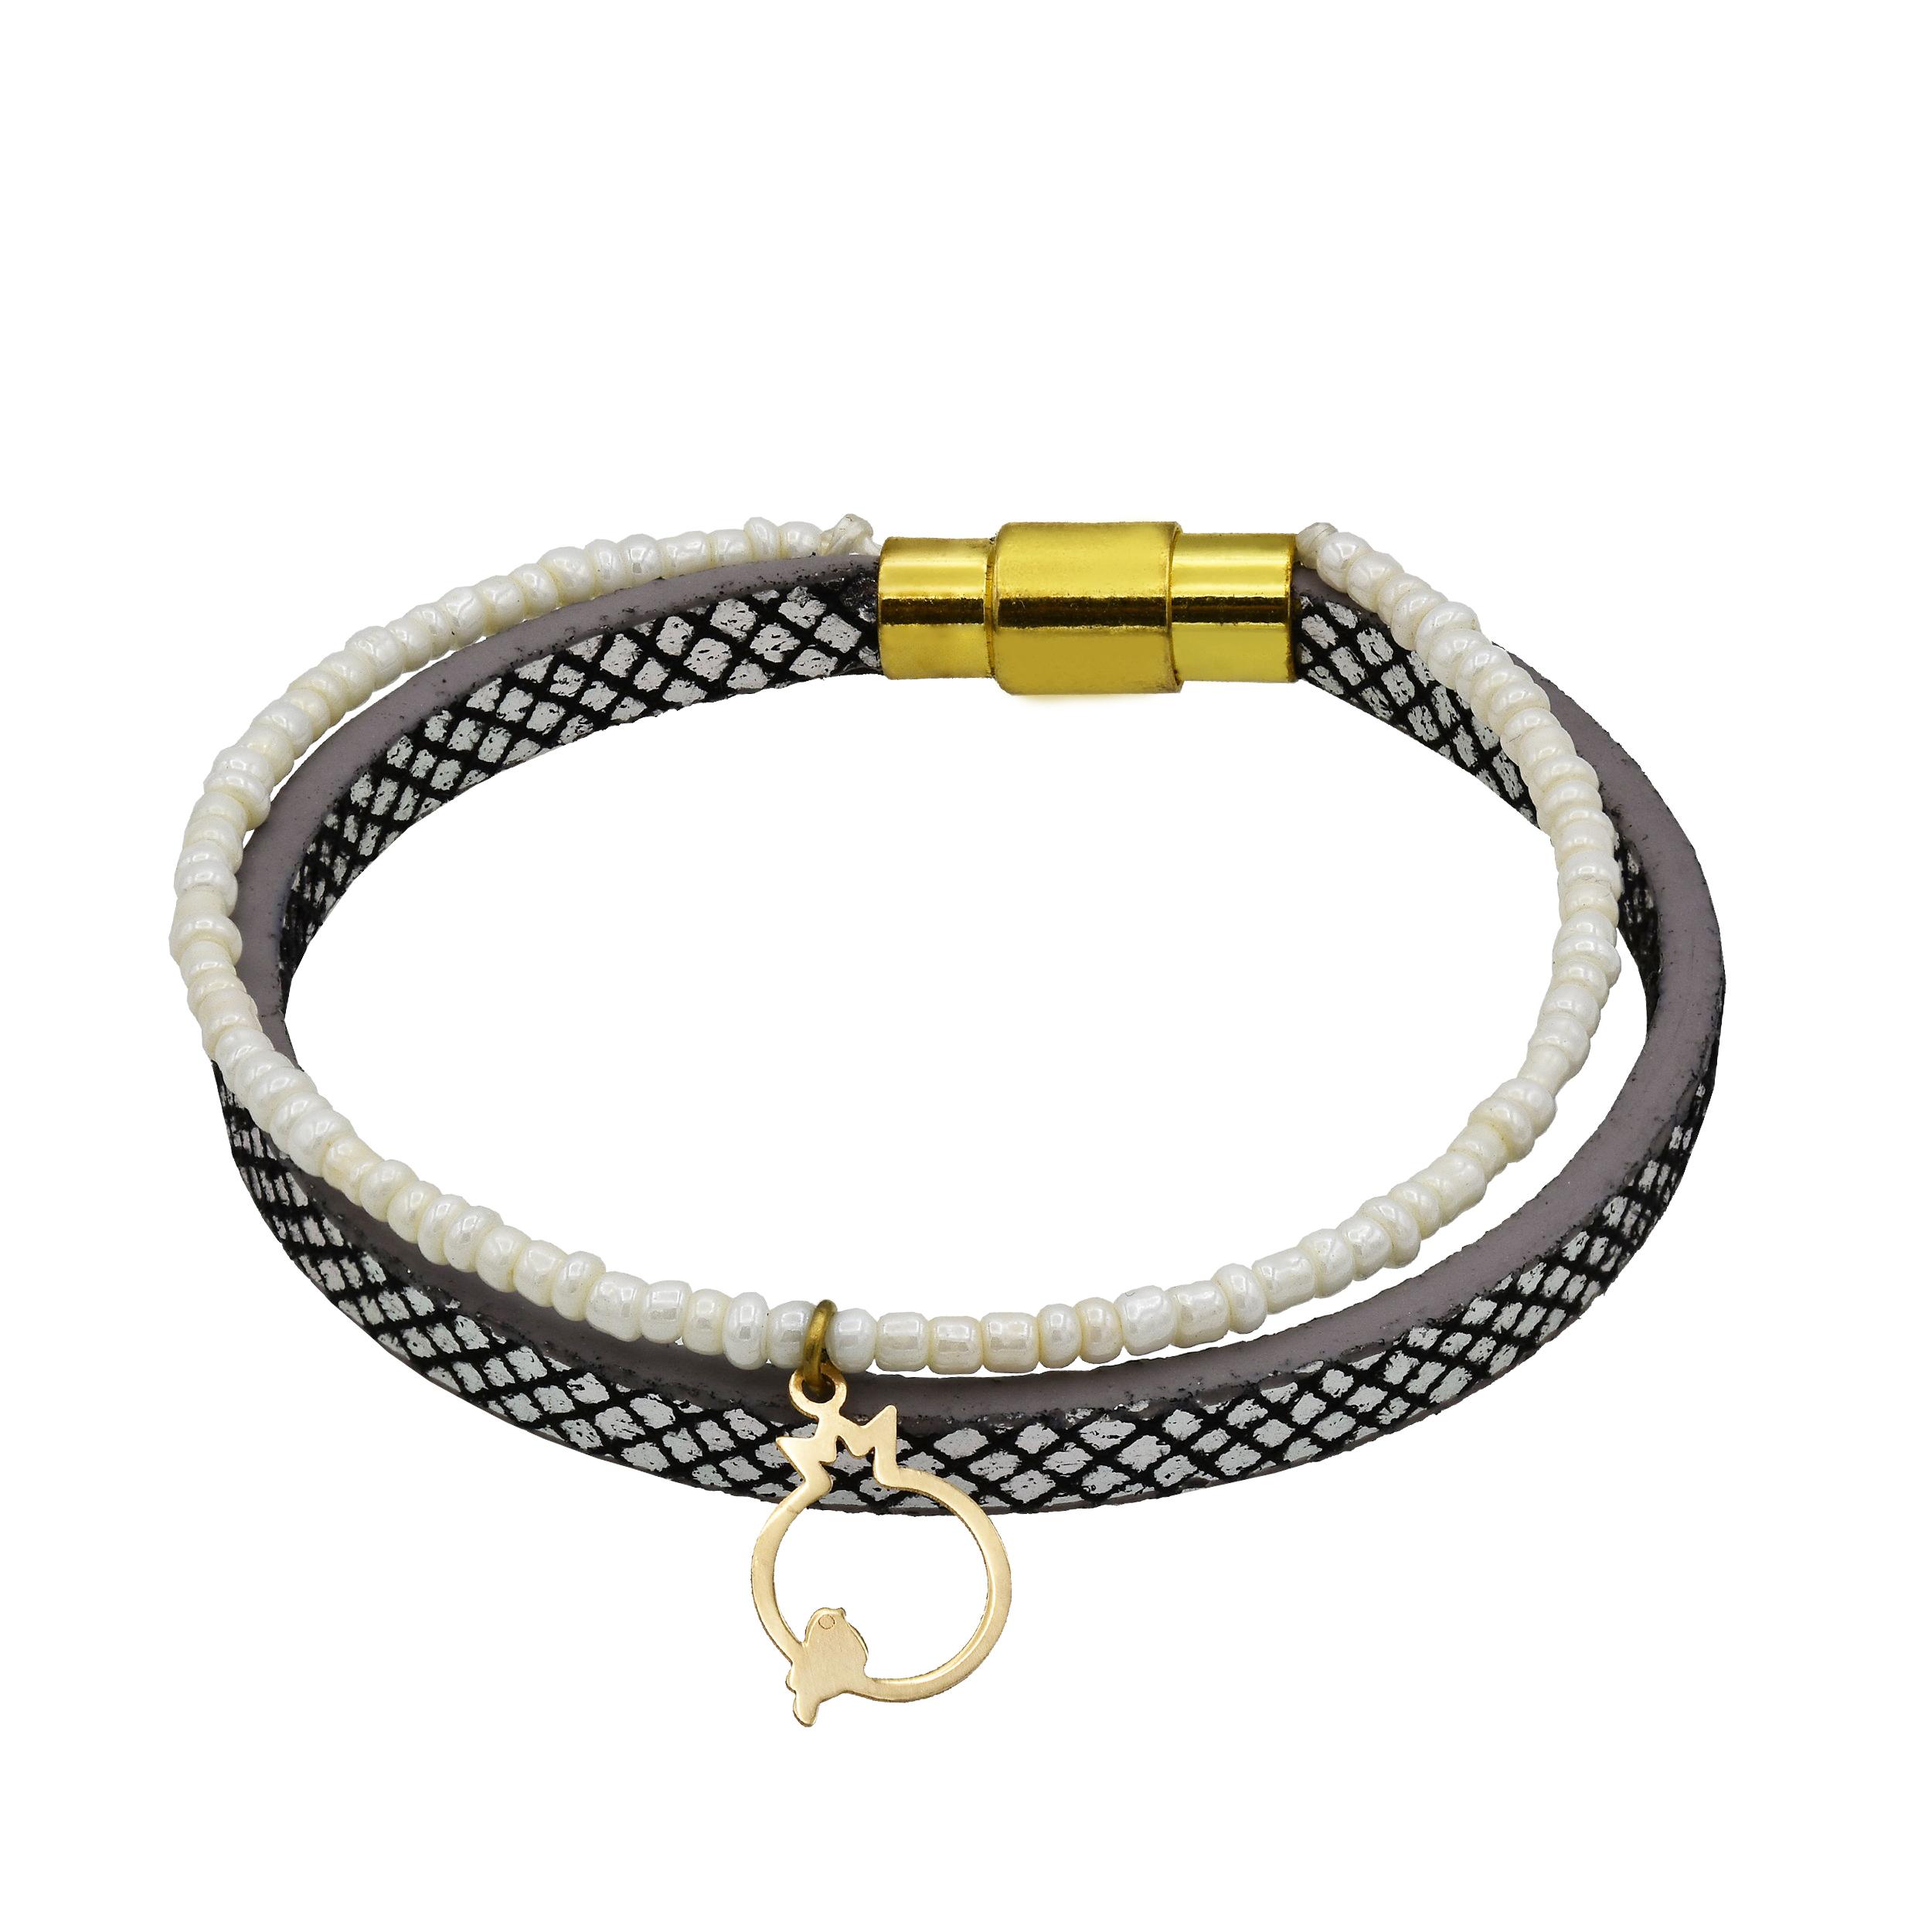 دستبند طلا 18 عیار زنانه آمانژ طرح انار کد 604D3060